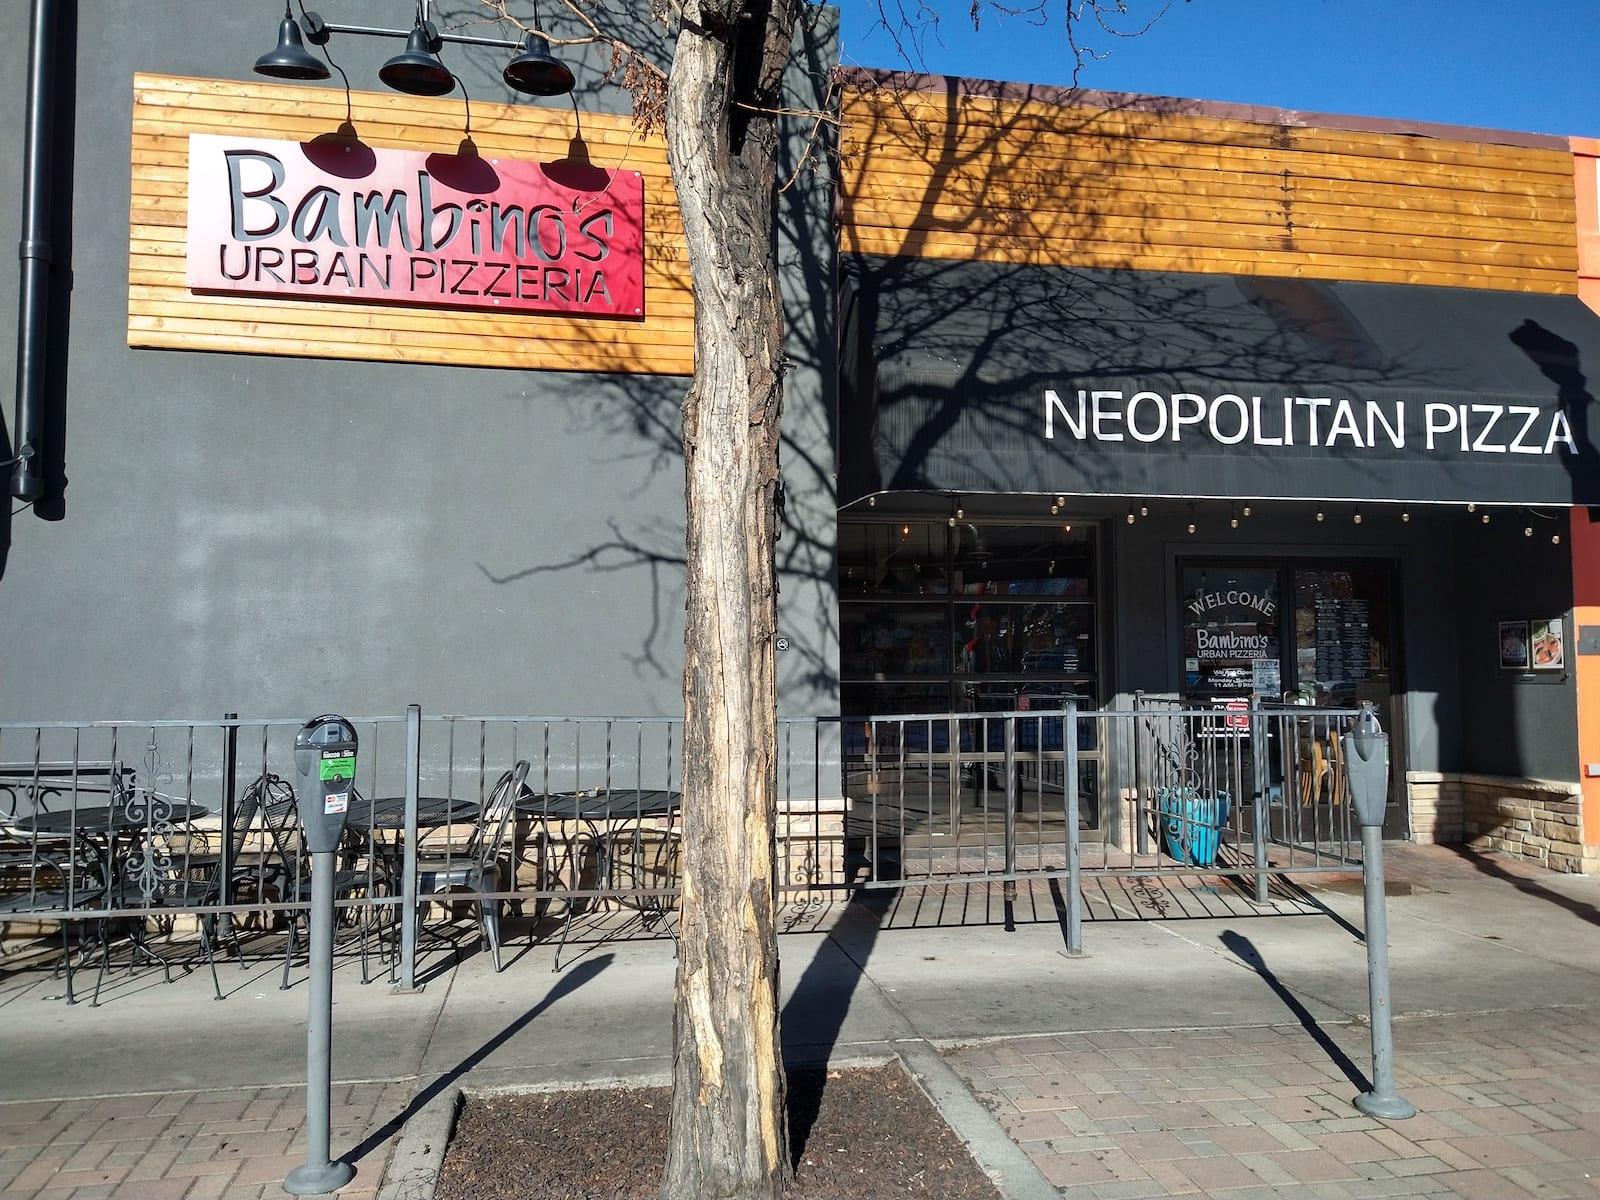 Bambinos Urban Pizzeria Colorado Springs